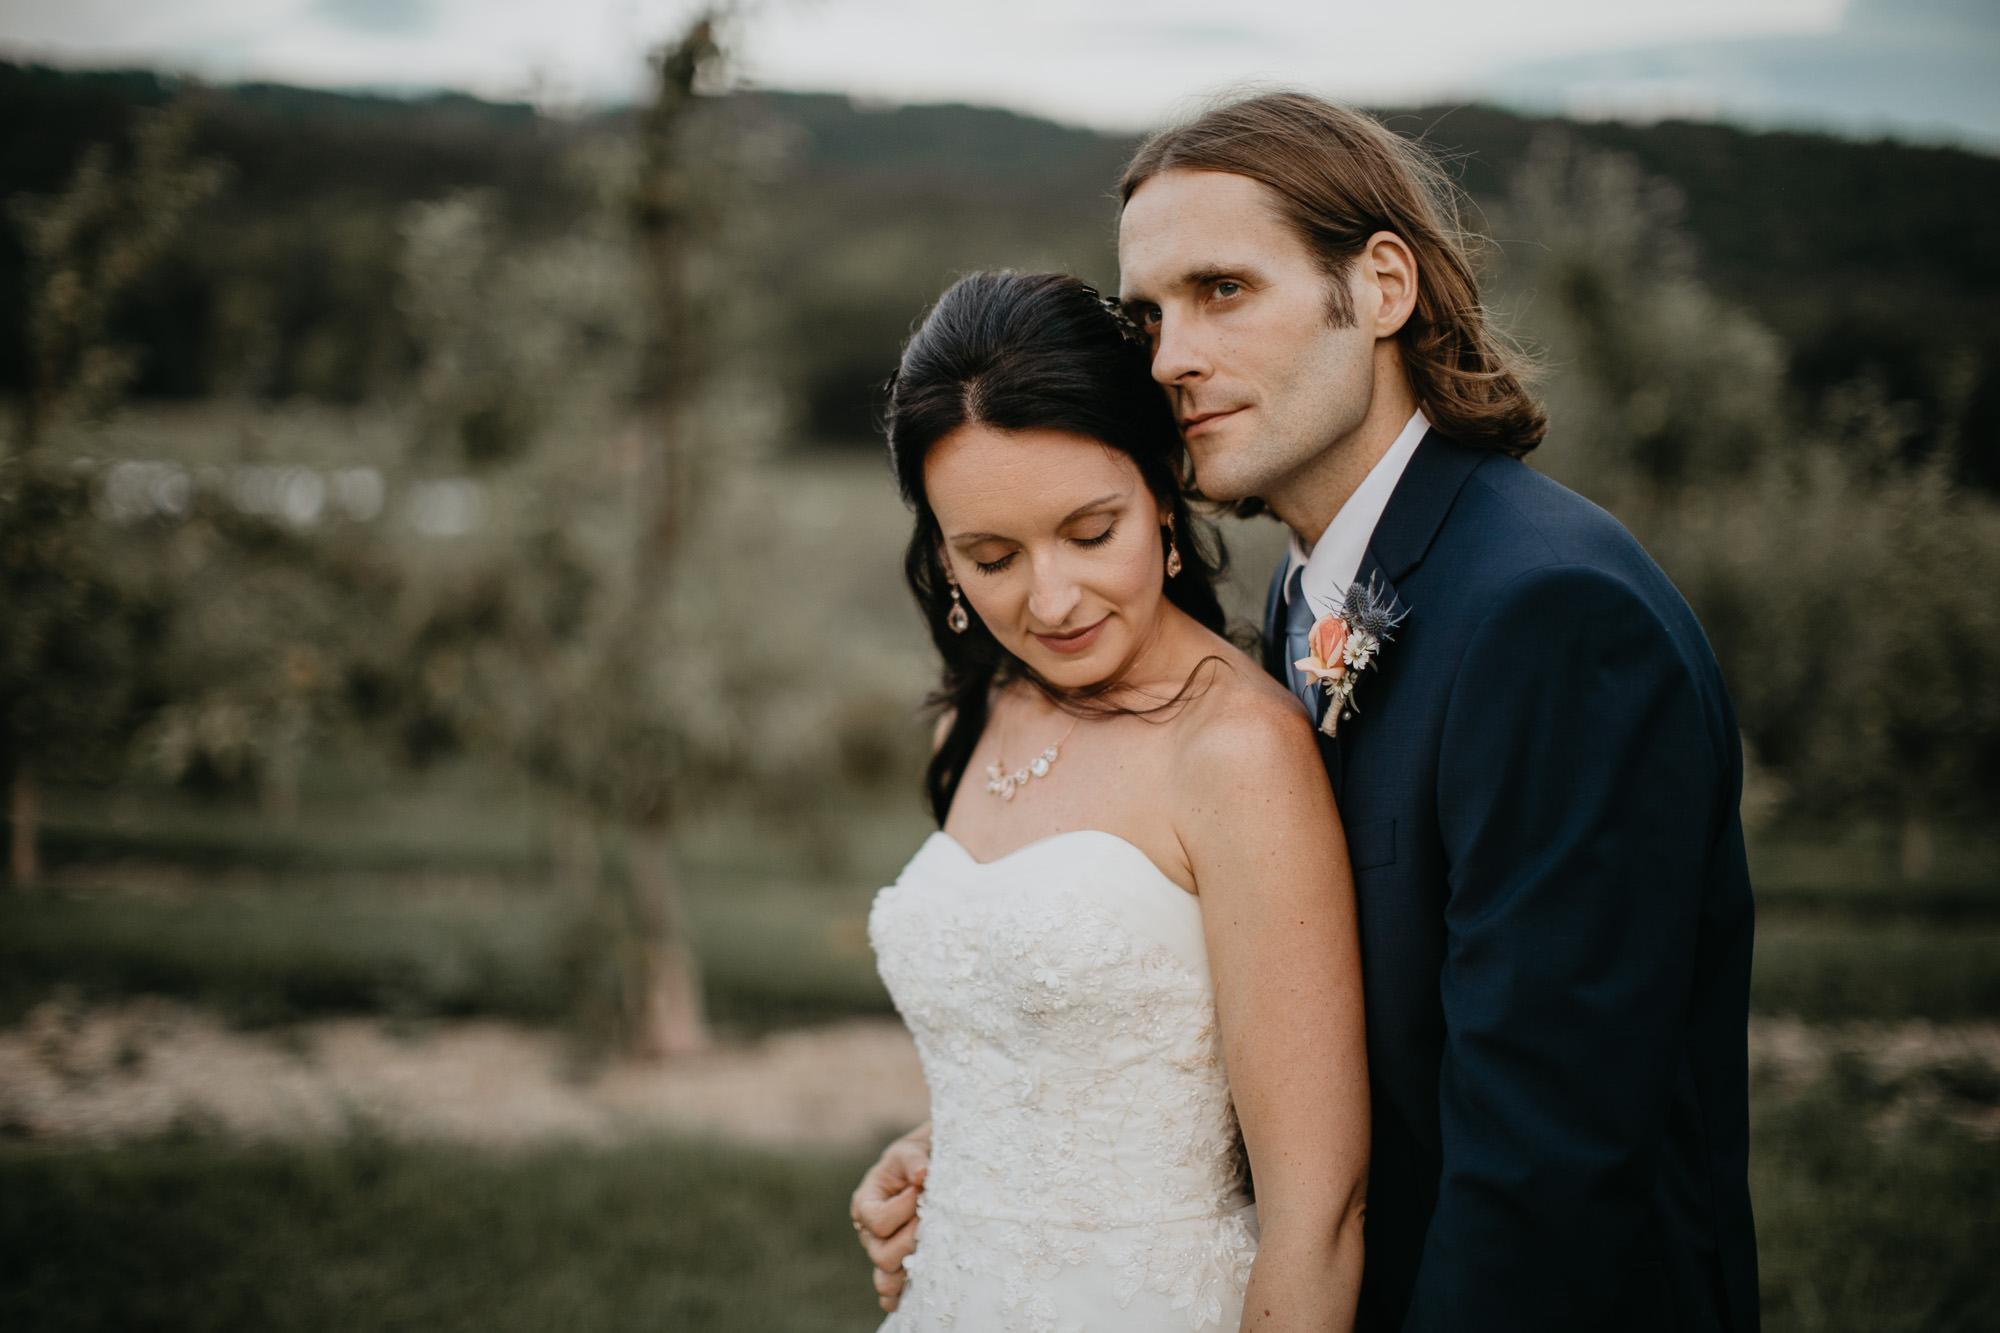 Doe Creek Farm - Weddings - Virginia - Best Wedding Photographer - Pat Cori Photography-53.jpg